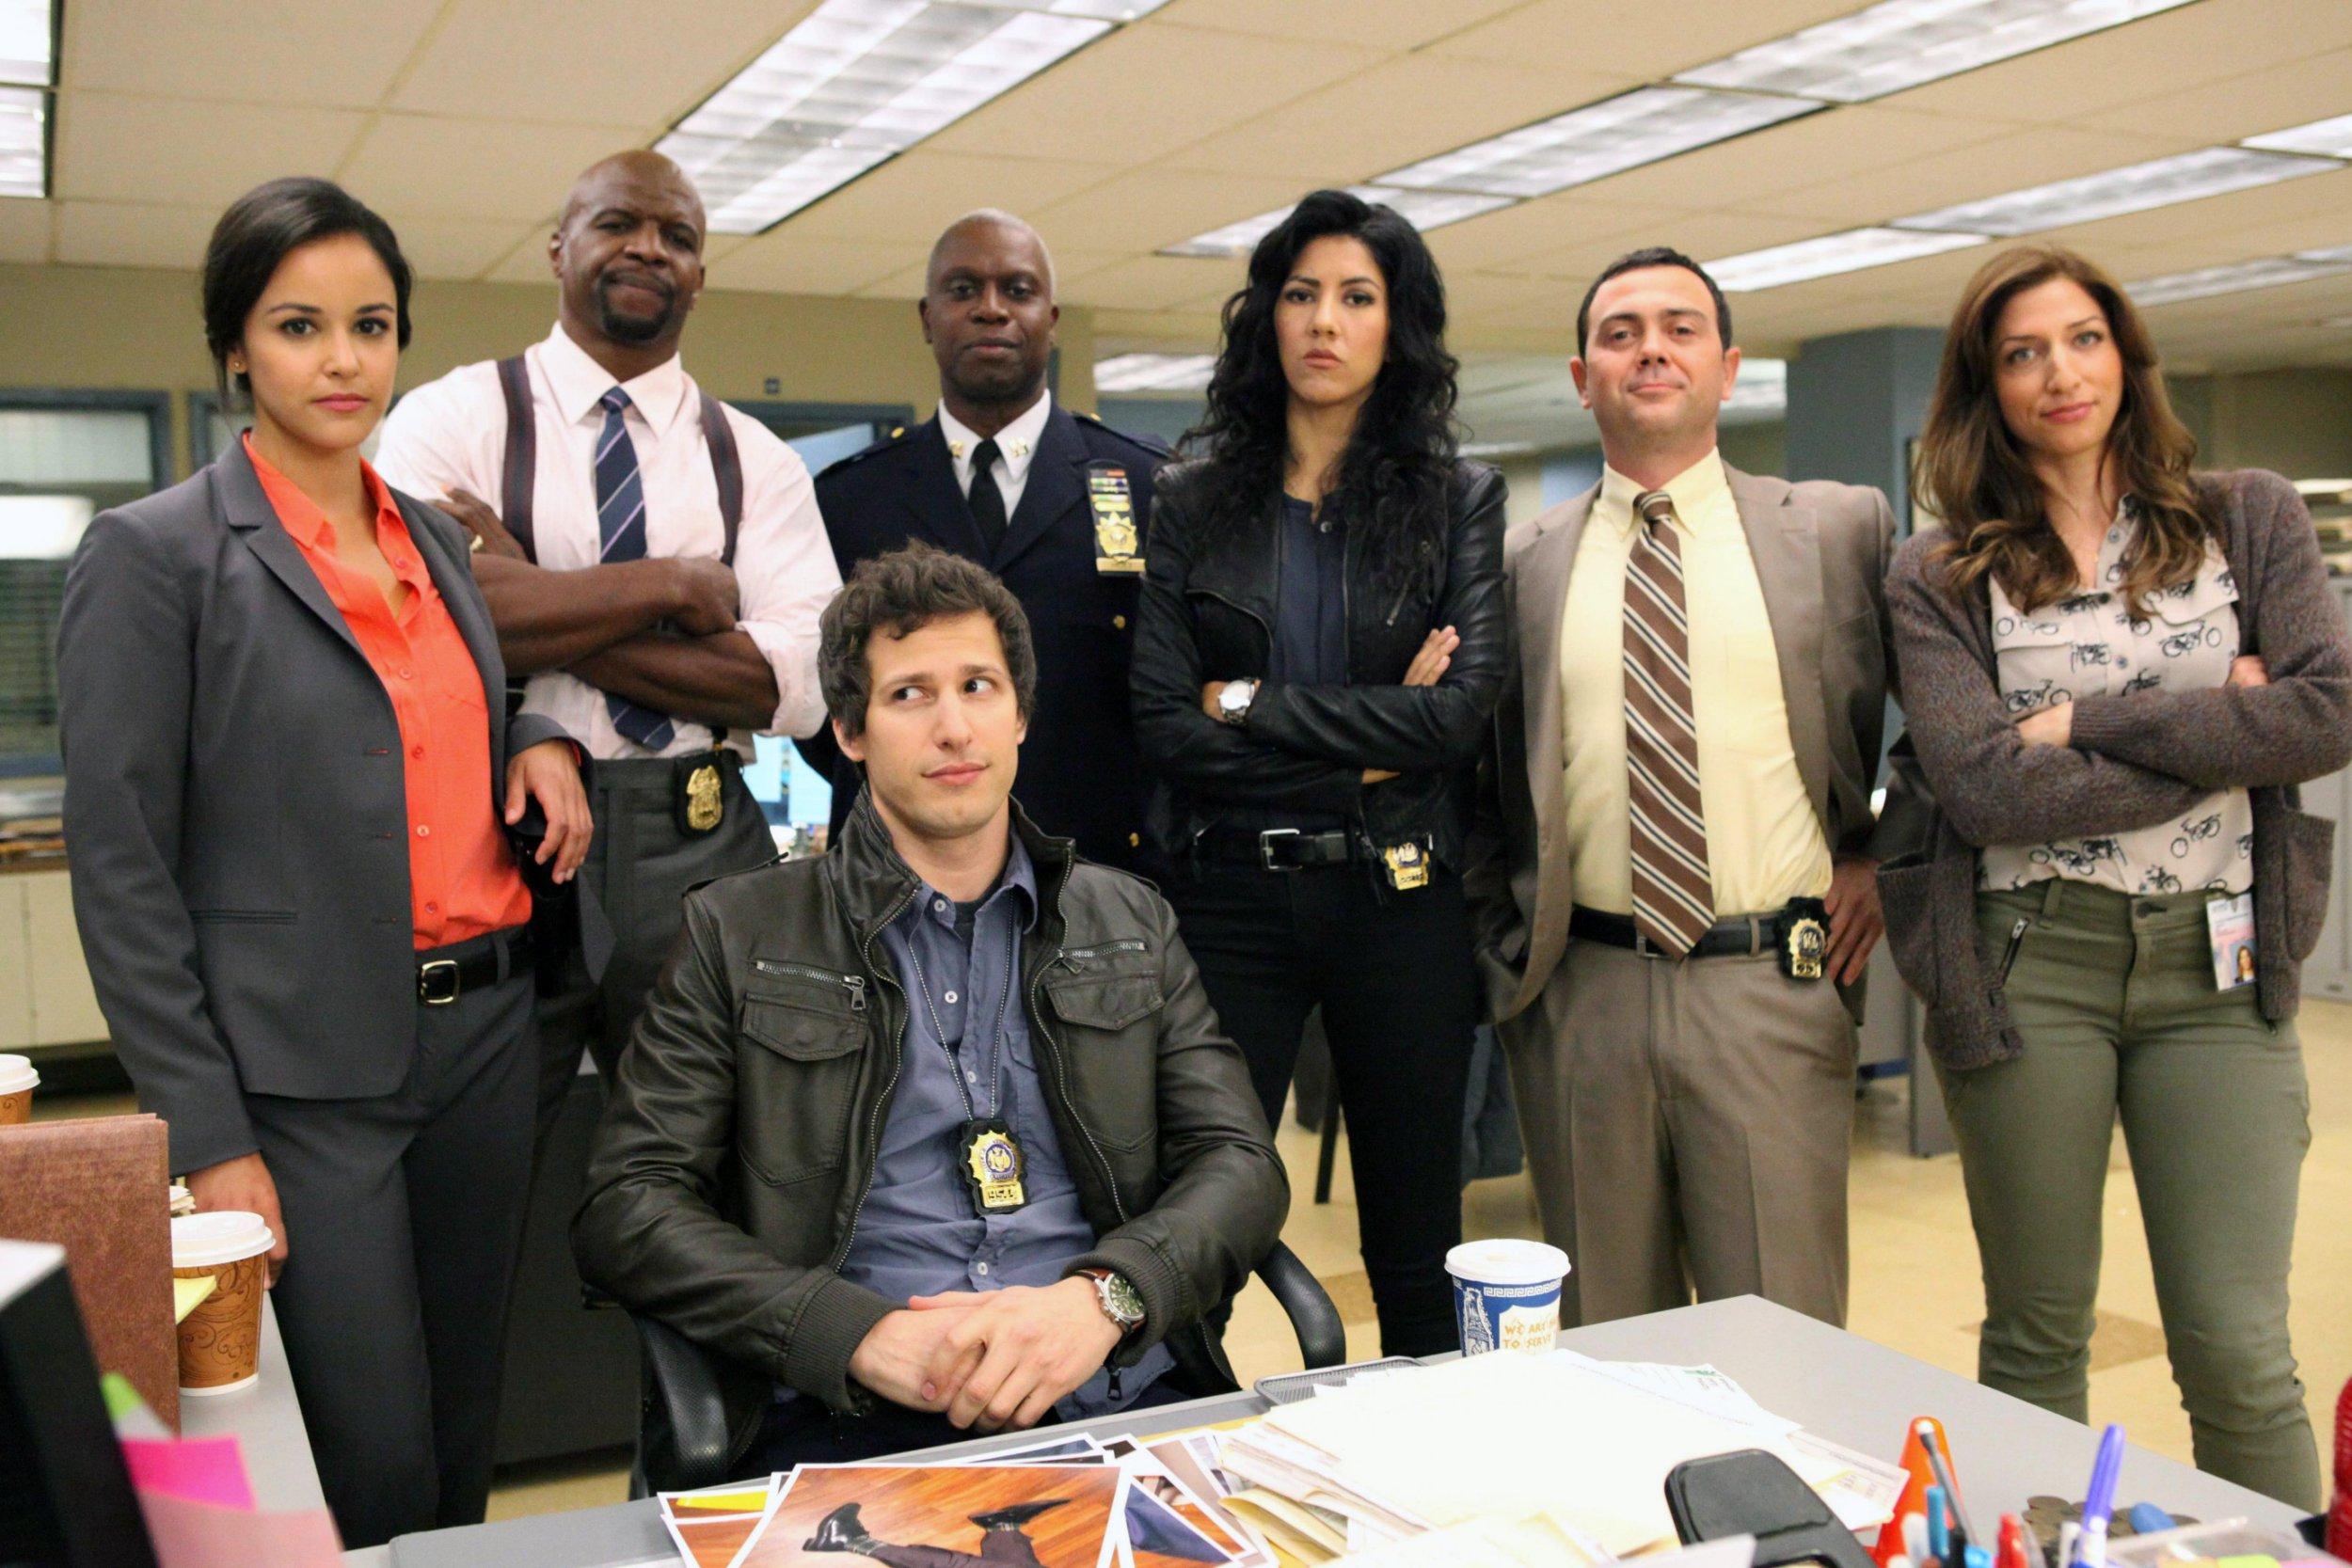 Andy Samberg admits 'there's question mark' surrounding Brooklyn Nine-Nine season 7